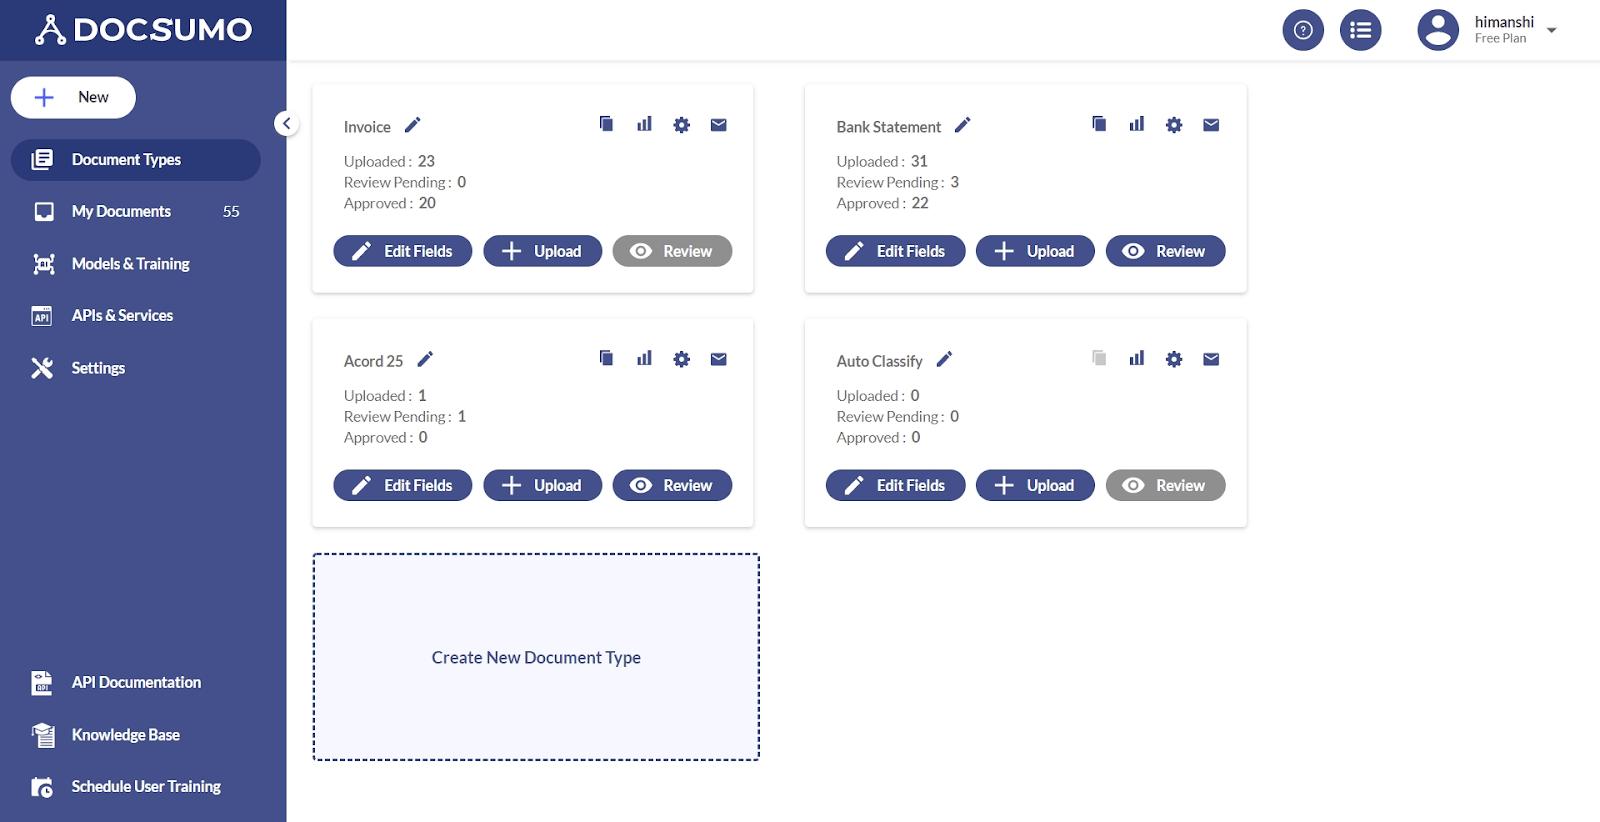 Create new document type with Docsumo